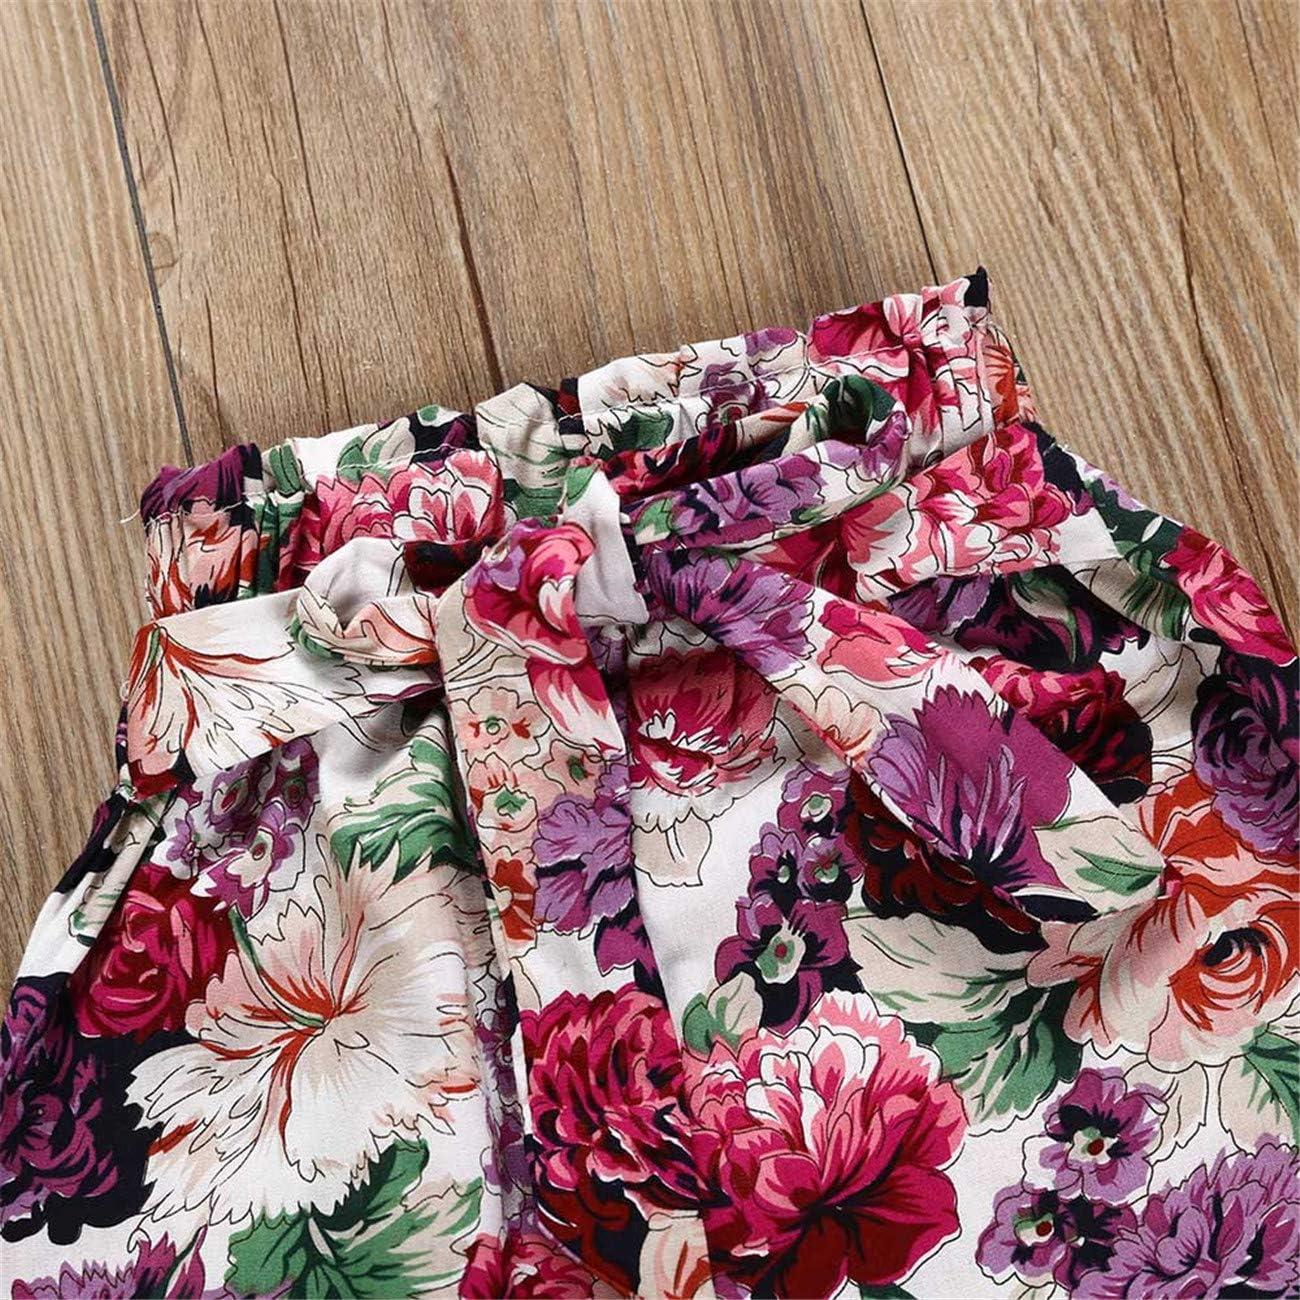 HCFKJ Ropa Bebe Ni/ñA Invierno Ni/ñO Manga Larga Camisetas BEB Conjuntos Moda Fruncido Mameluco Mono Floral Impresi/óN Pantalones Diadema Conjuntos